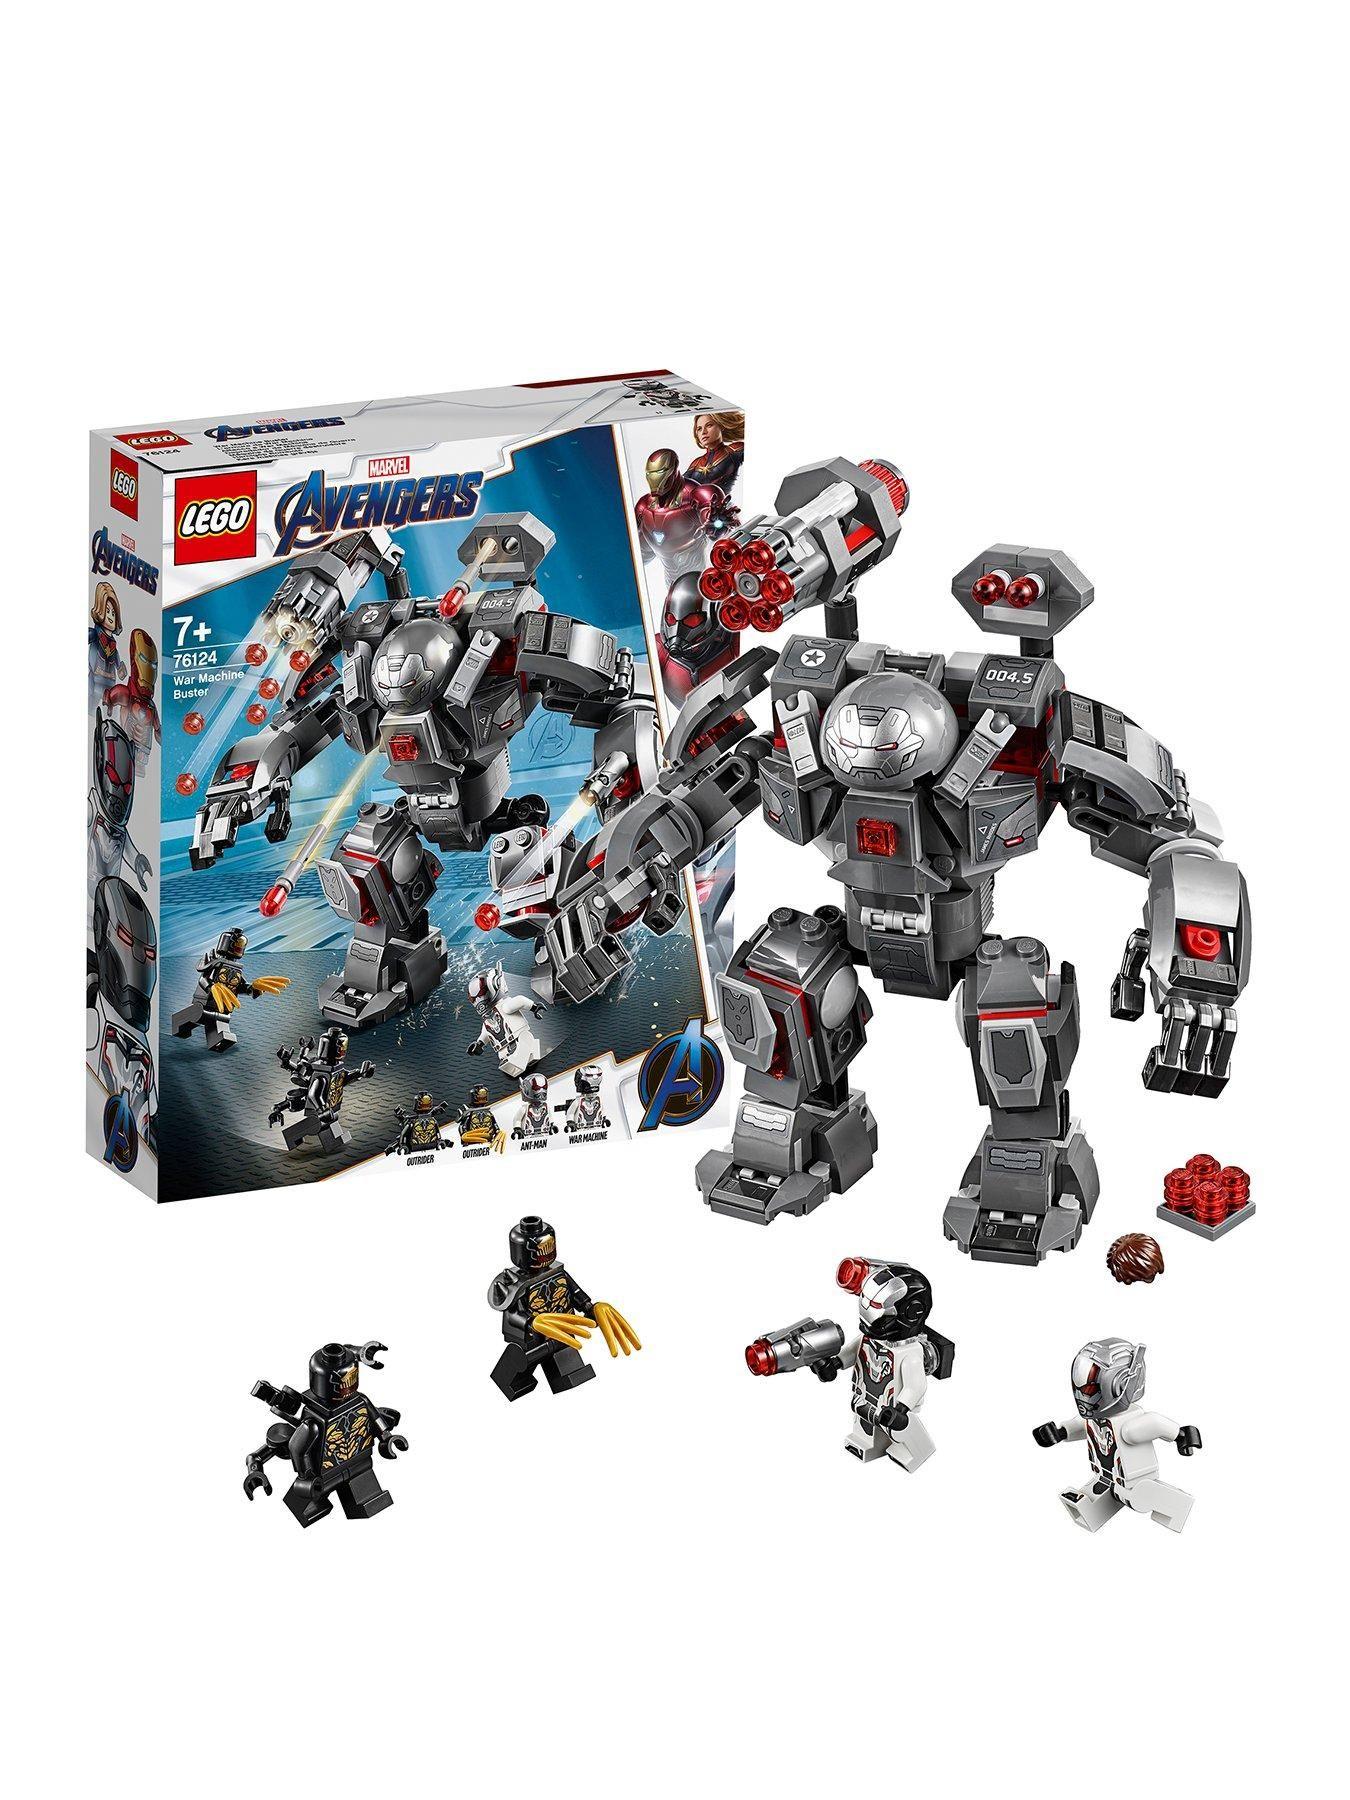 LEGO Avengers Endgame Lot of 2 Outrider Minifigures 76124 Mini Figs